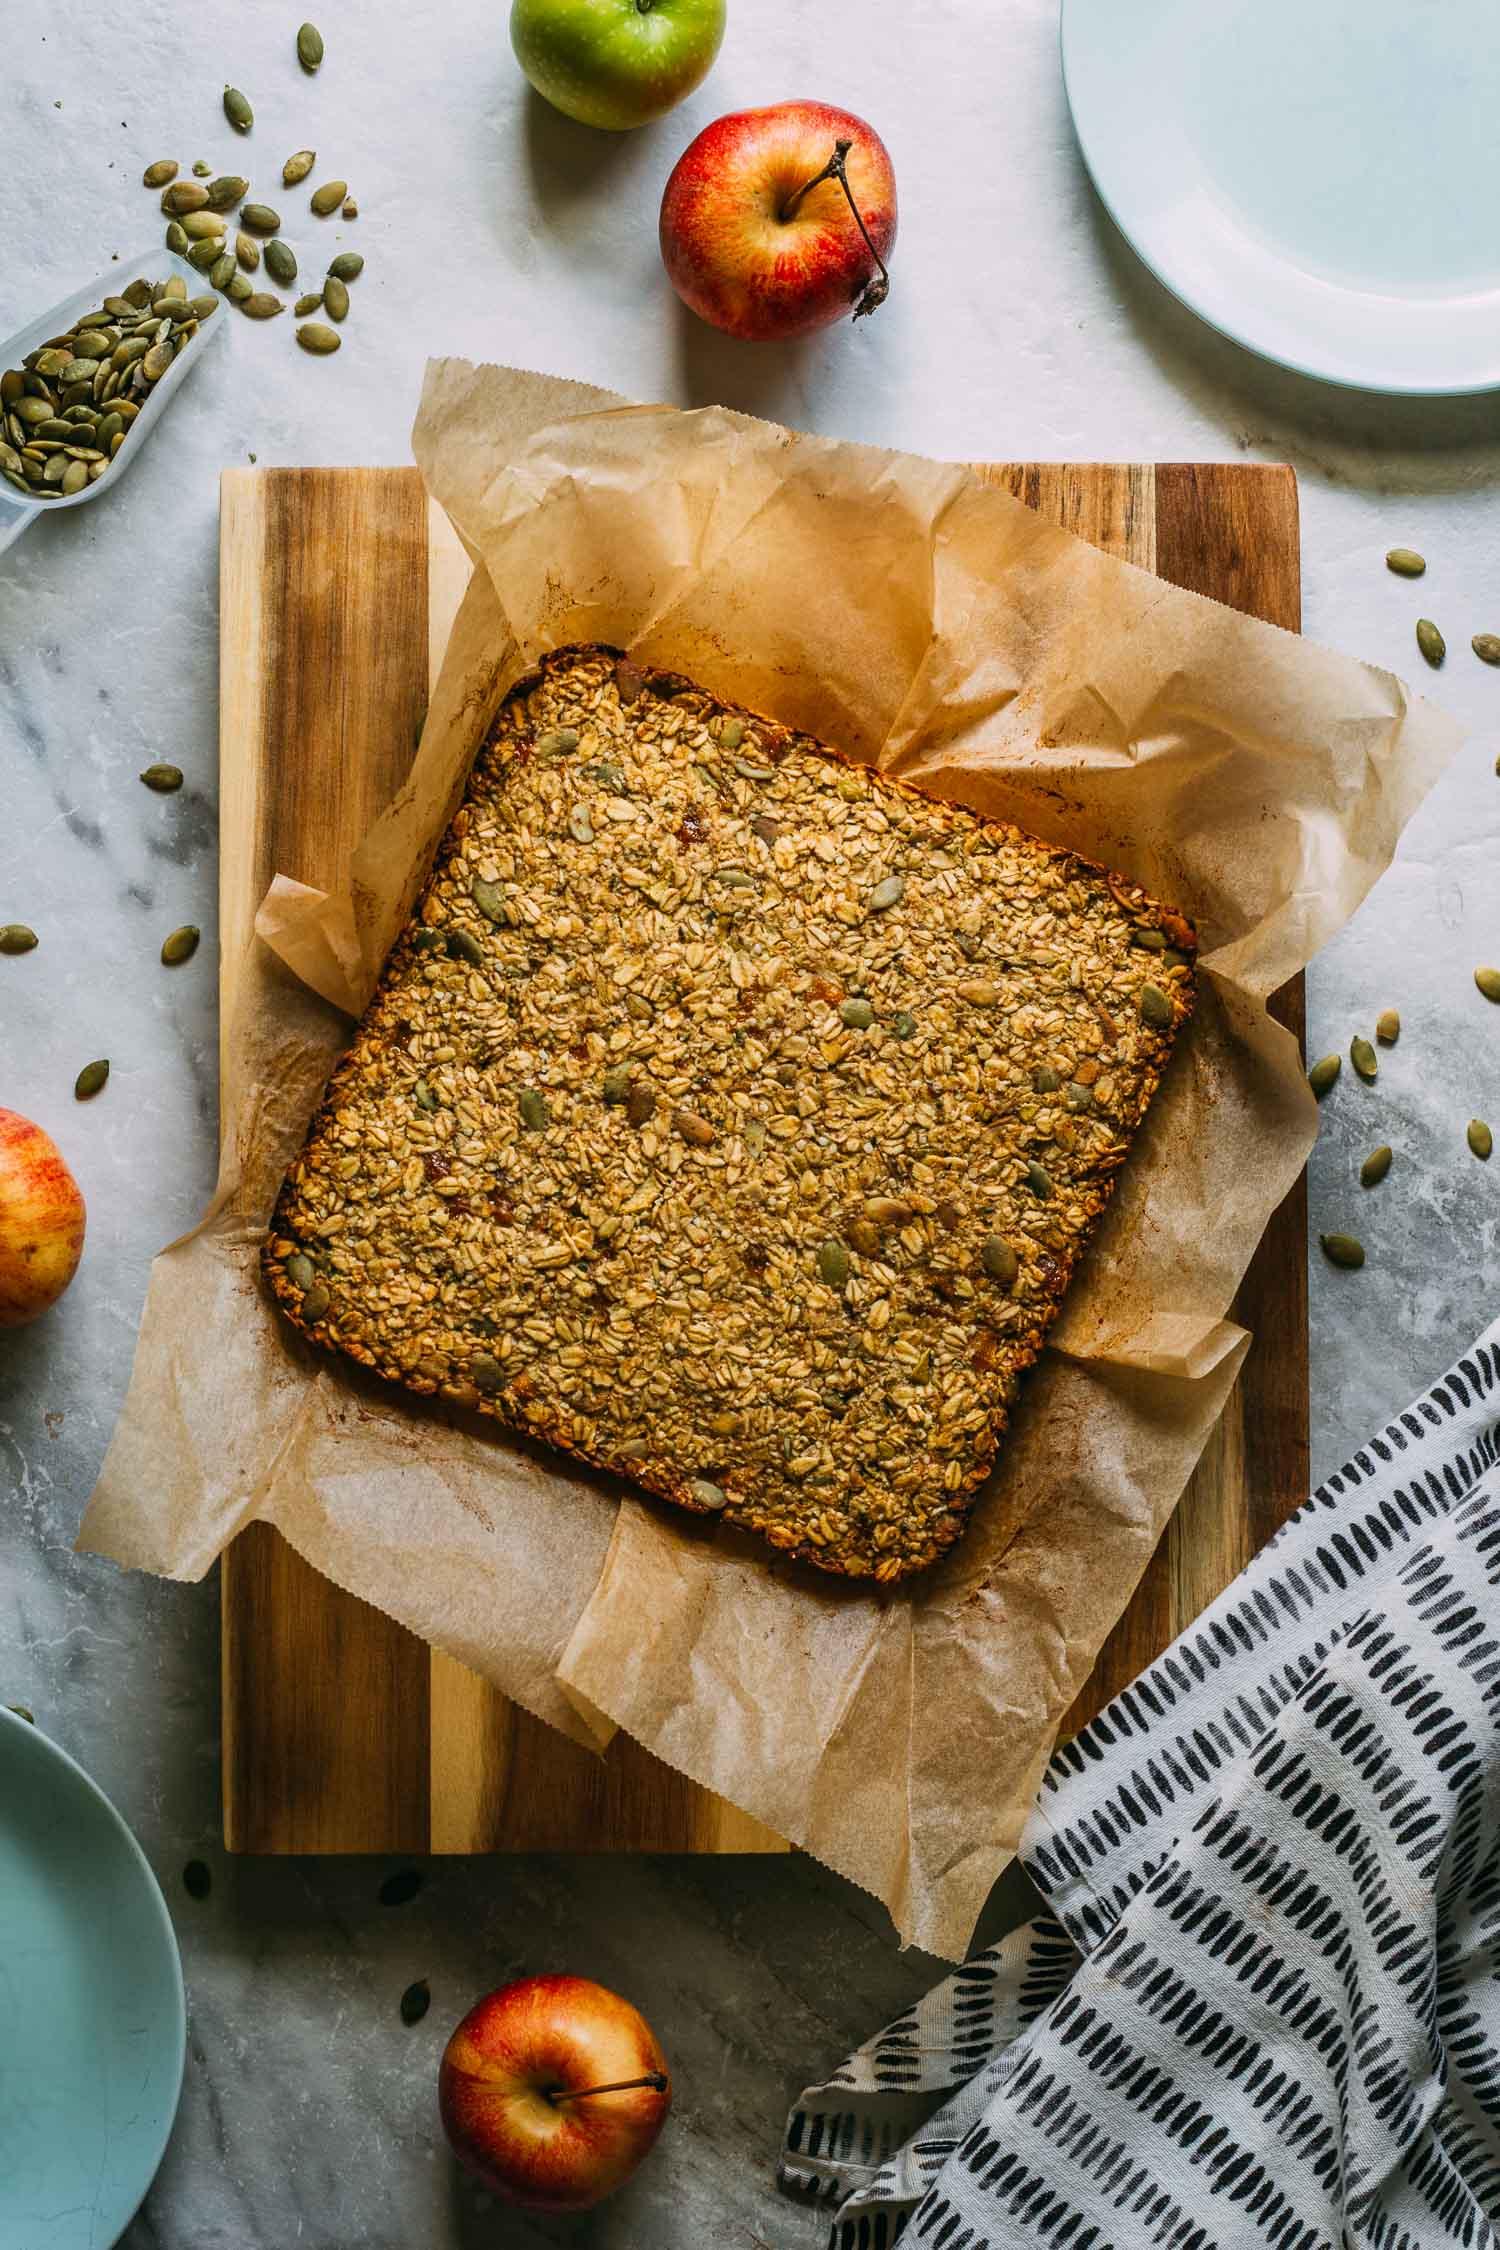 Tahini Mango Granola Bars #tahini #hempseeds #pumkinseeds #tailgating #snacks #healthy #recipe